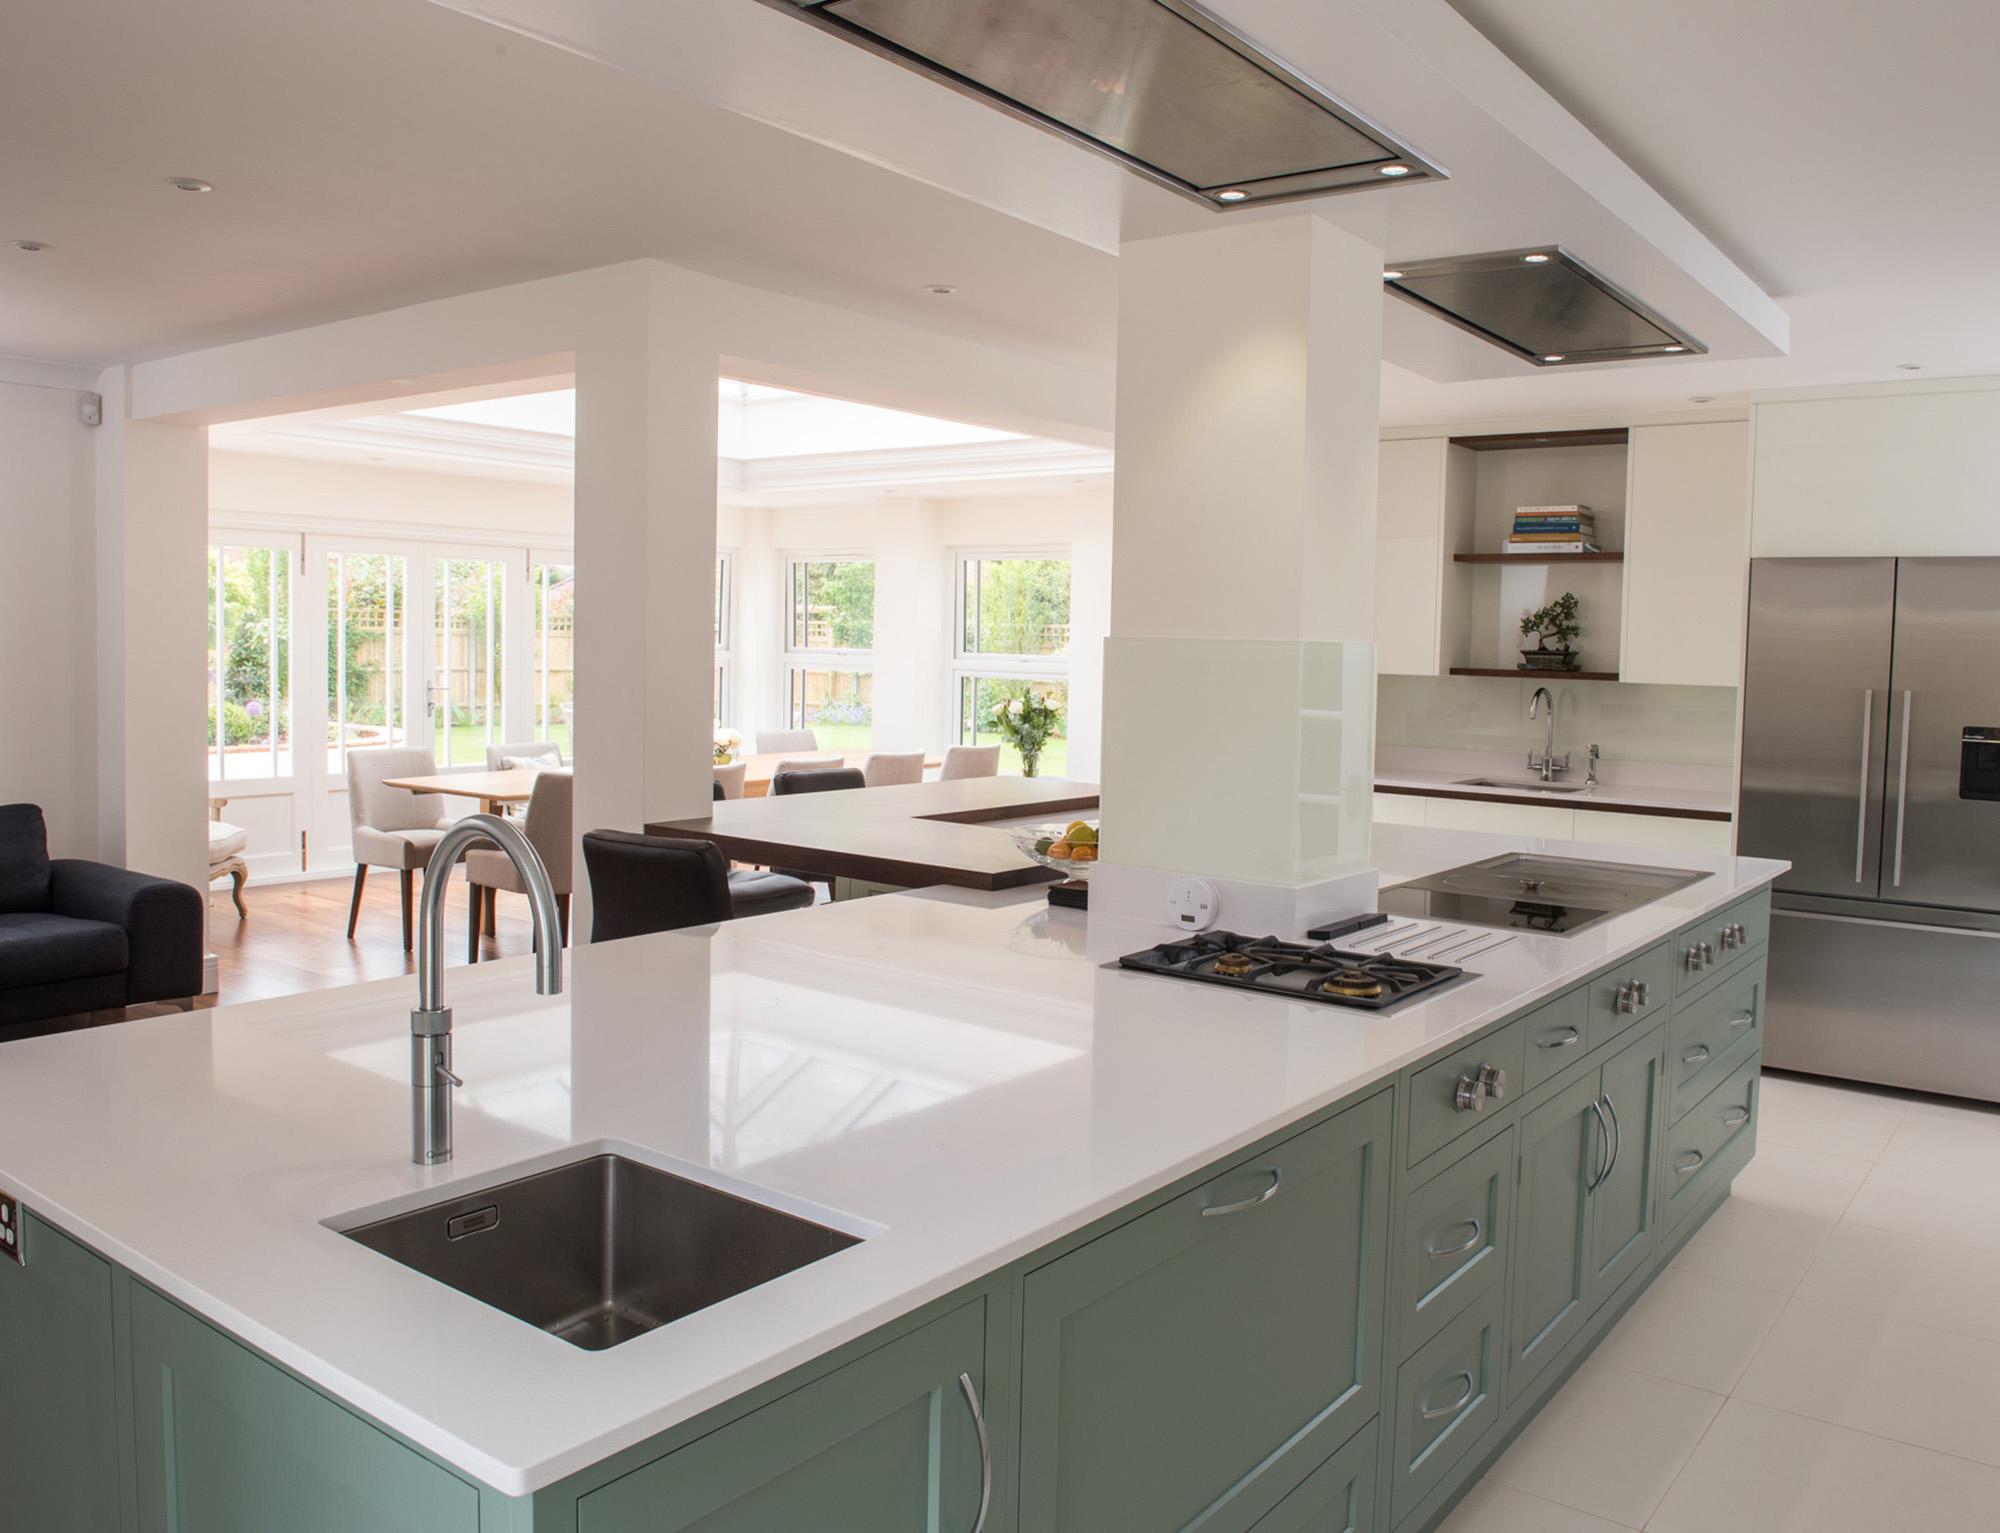 Bespoke Kitchens edmondson interiors | bespoke kitchens u0026 furniture QDGDWUZ